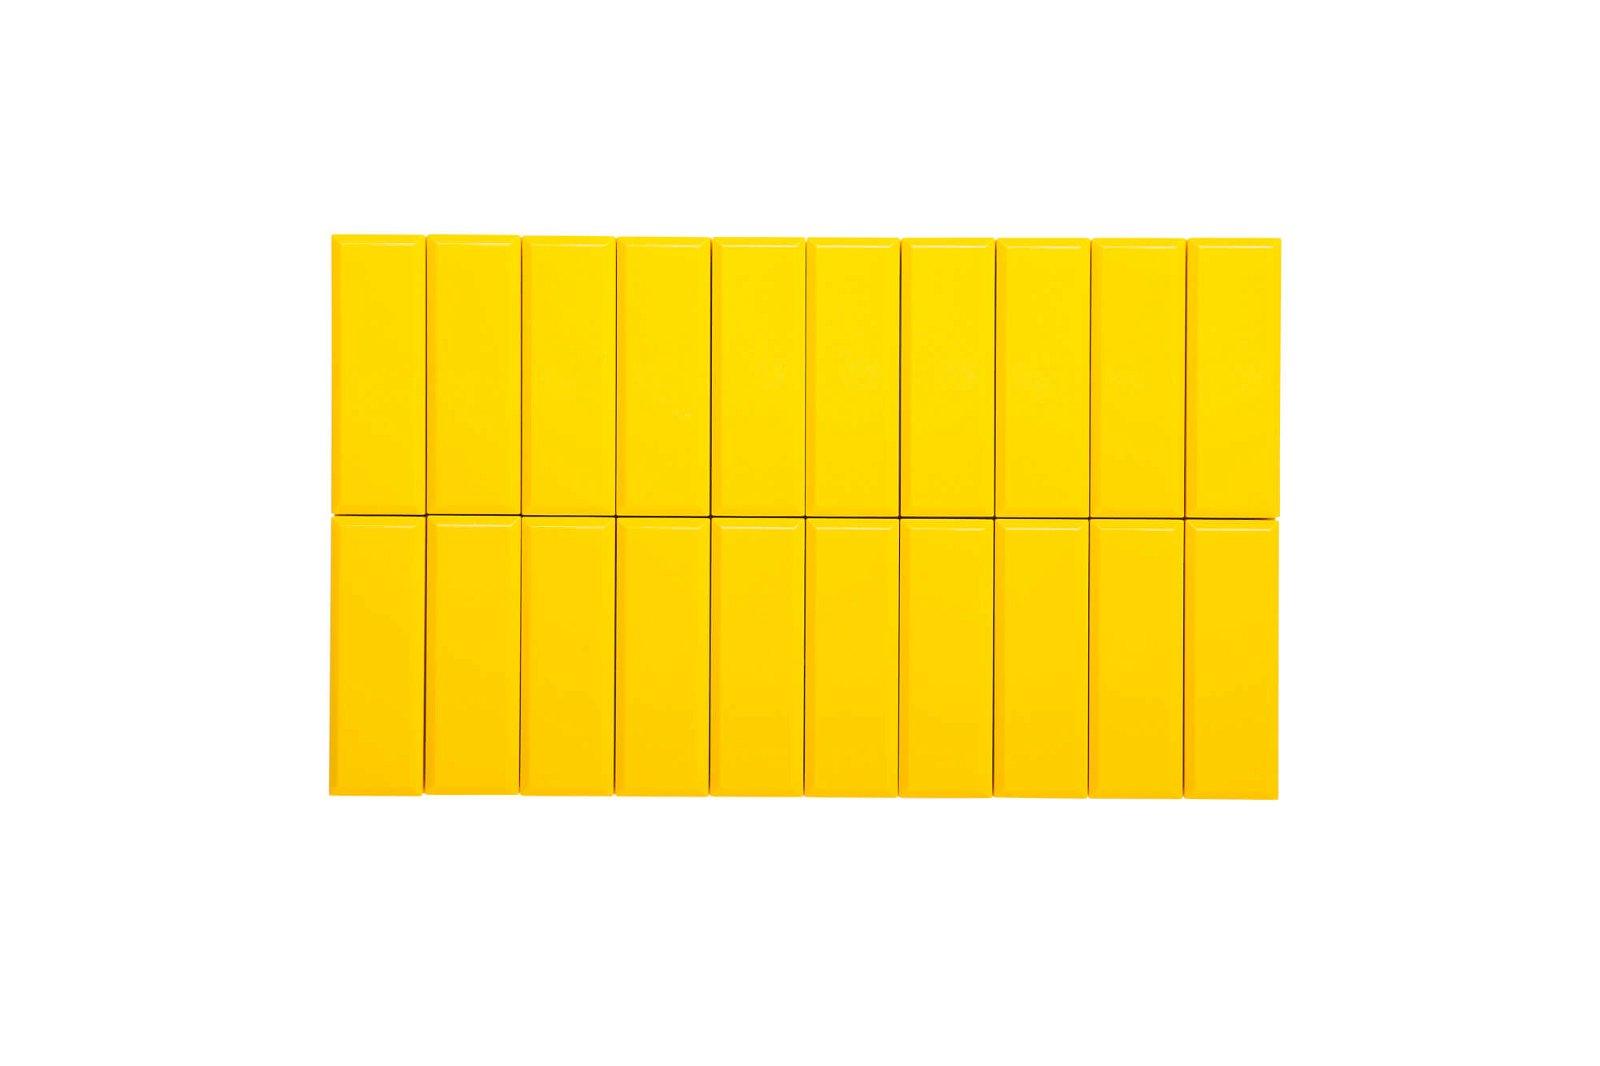 Facetterand-Magnet MAULpro 53 x 18 mm, 1 kg, 20 St./Set, gelb